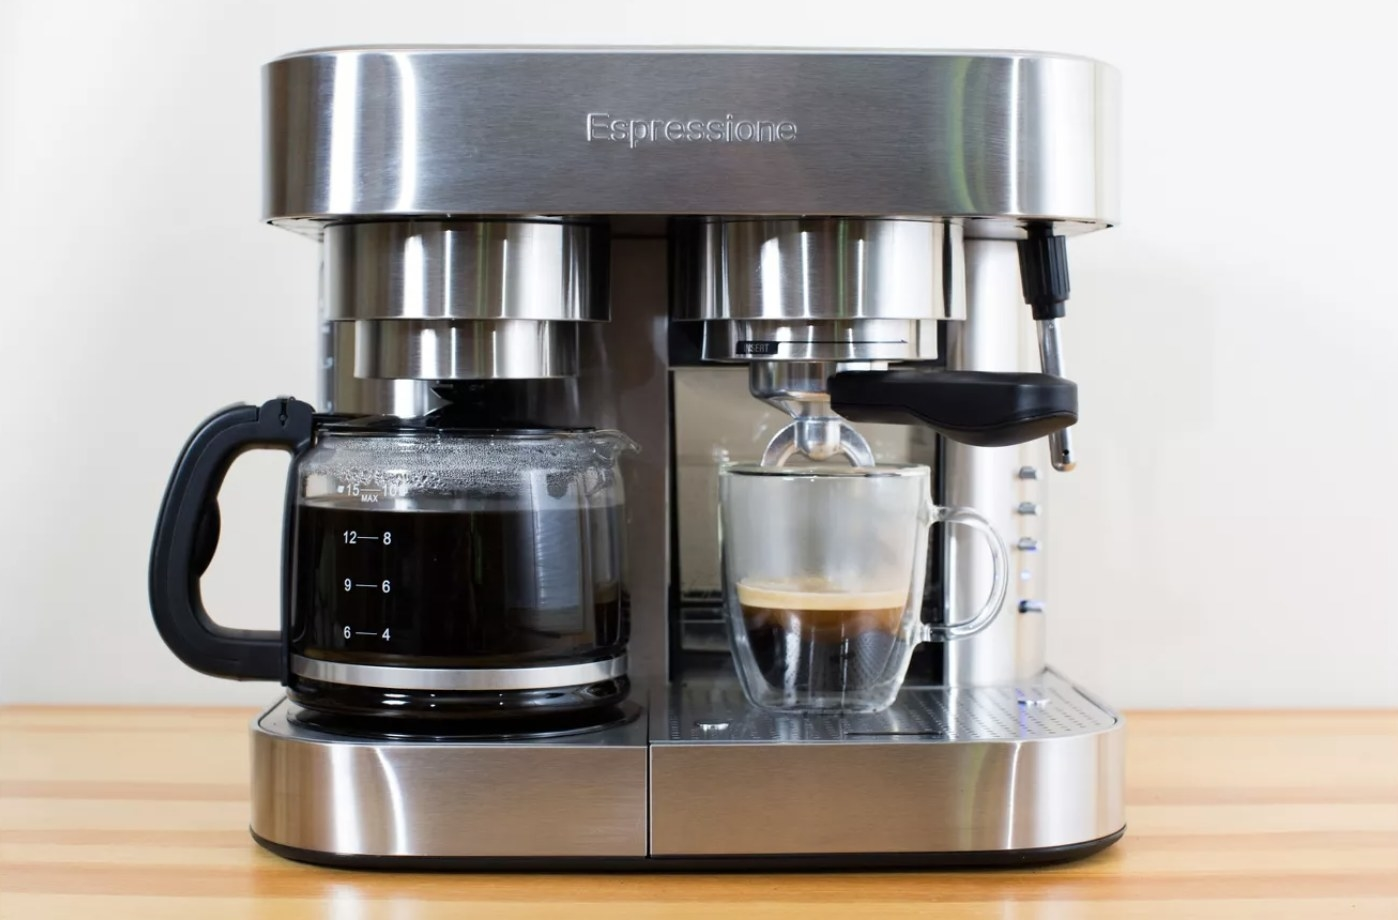 Coffee/Espresso machine sitting on counter.